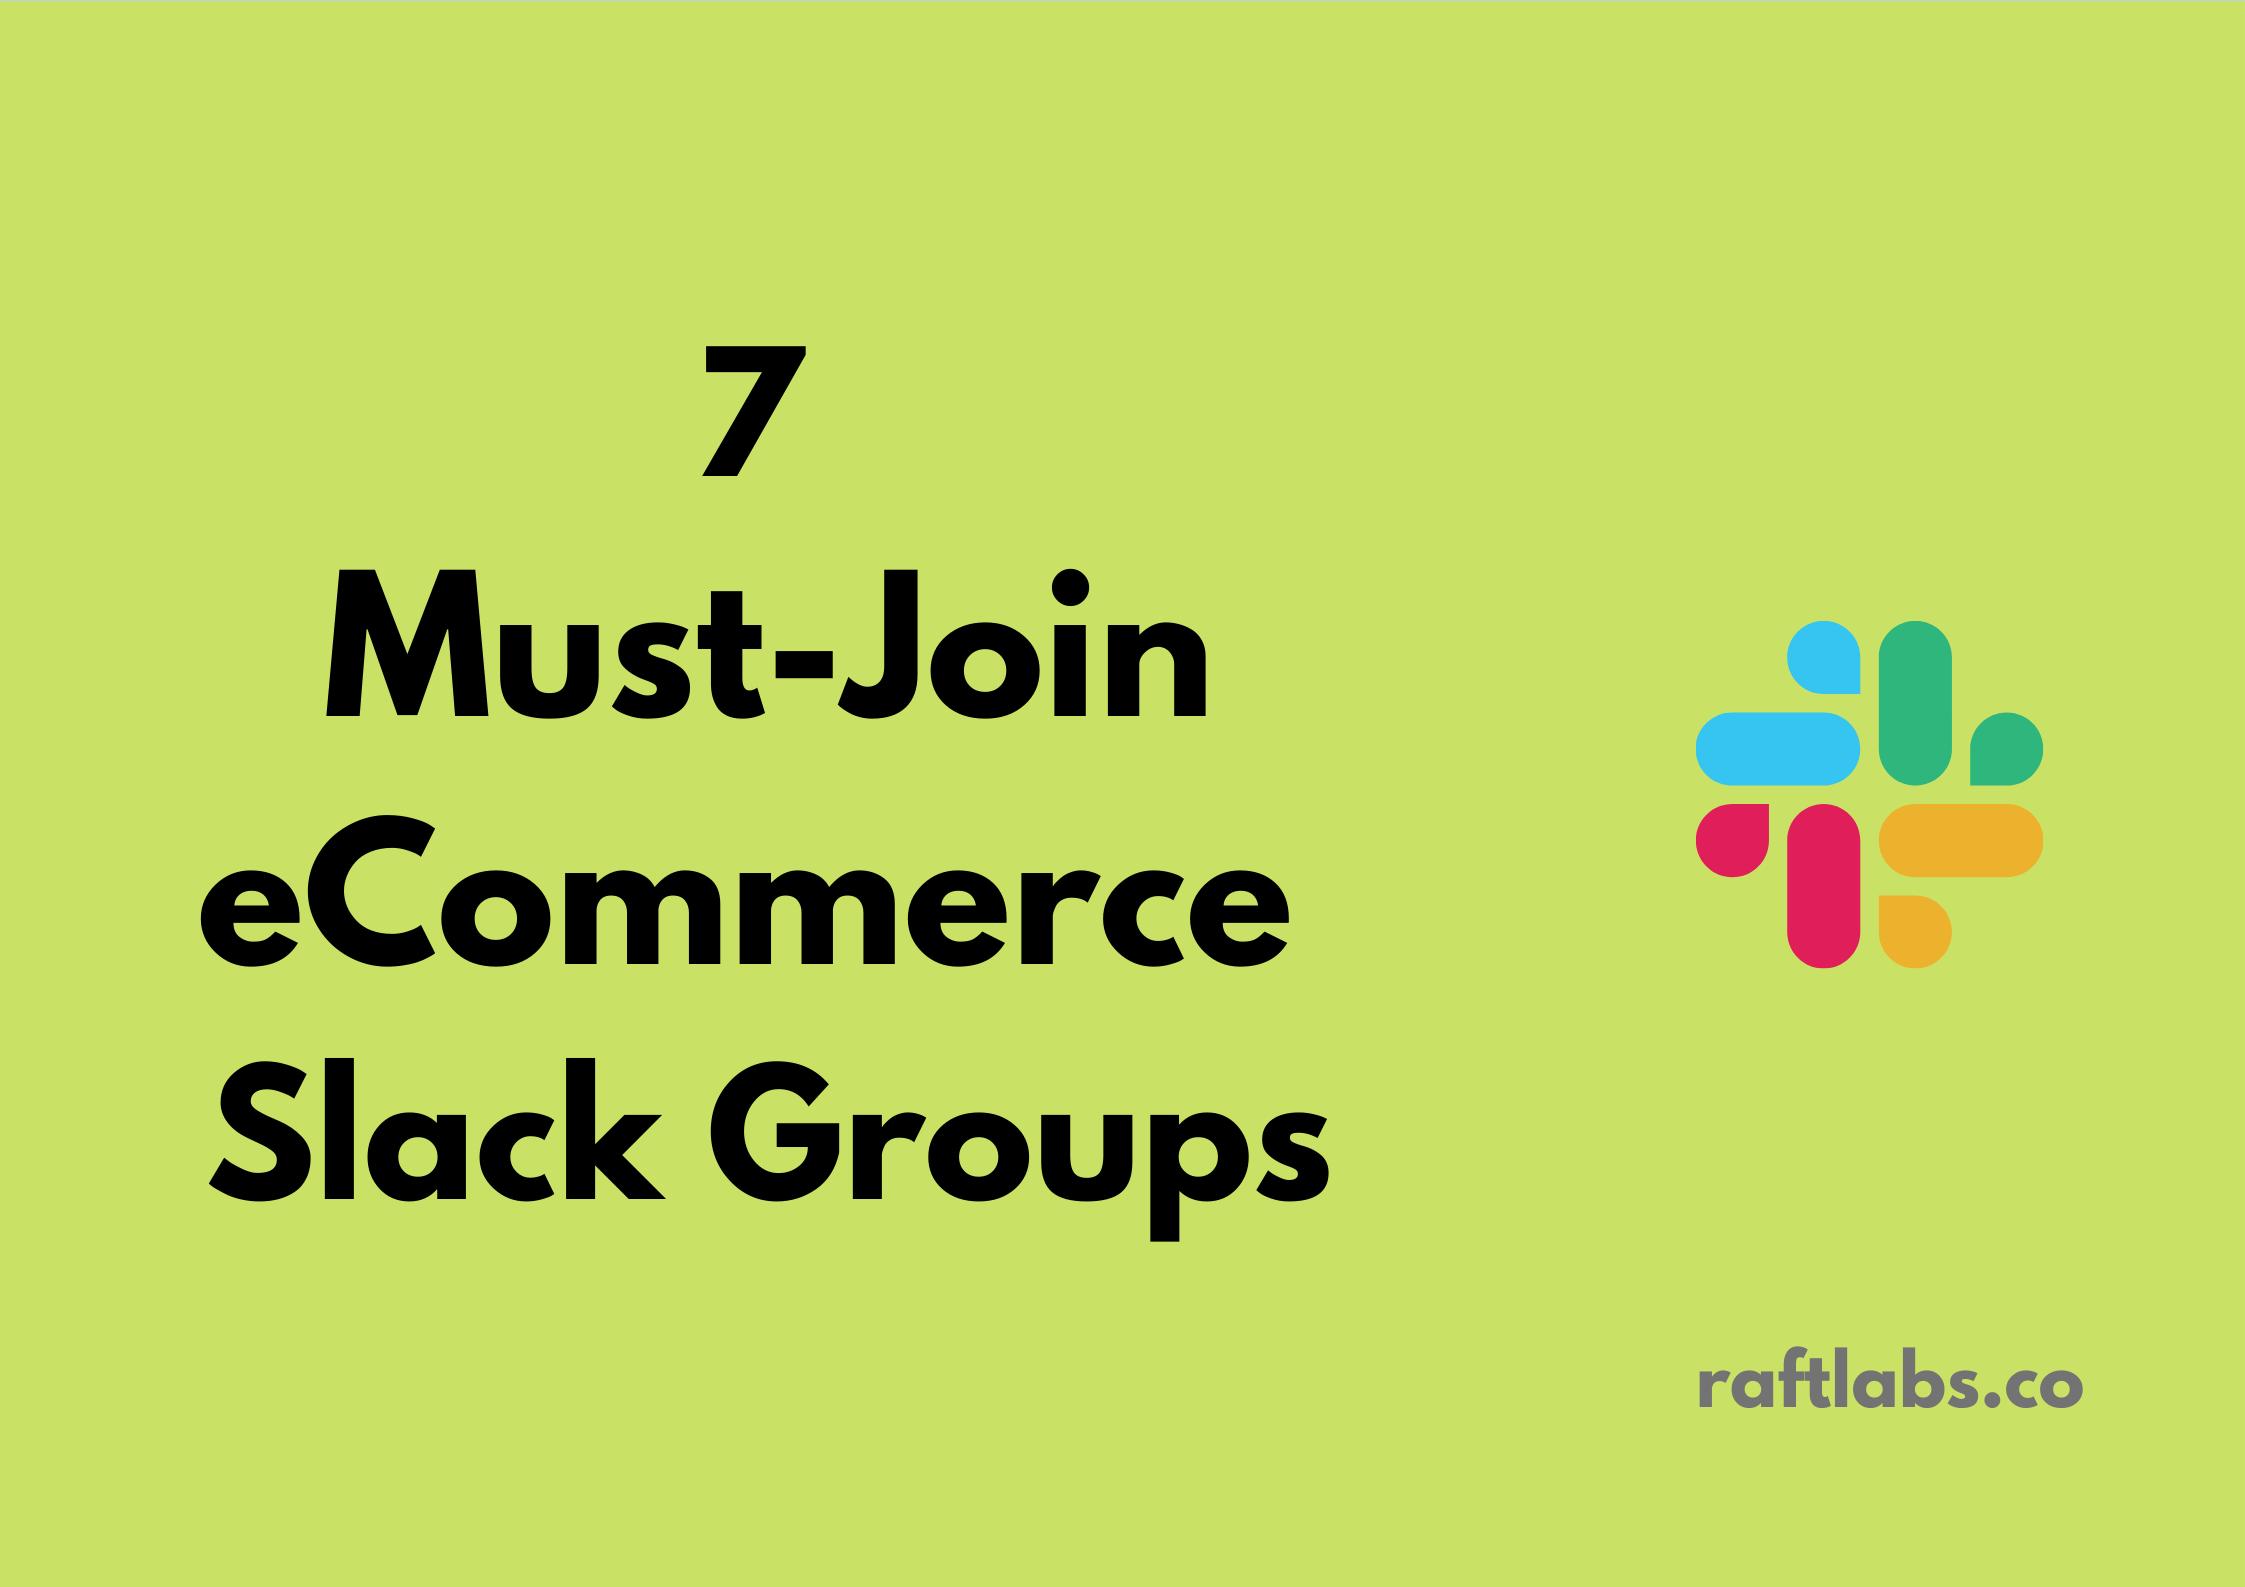 Handpicked list of best eCommerce Slack Groups| raftlabs